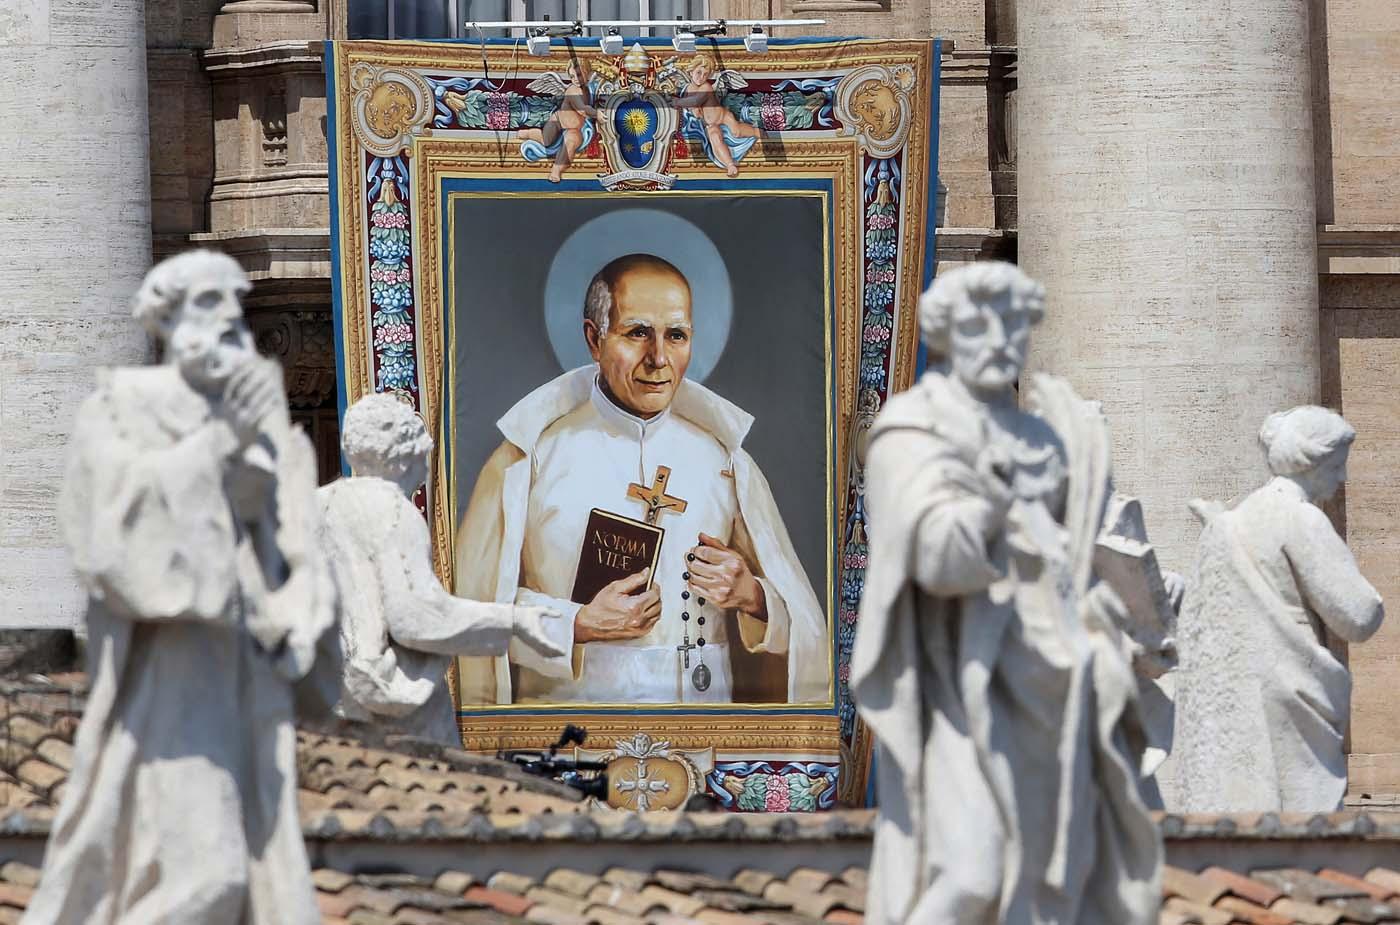 2016-06-05T100232Z_912273461_S1AETIDERWAA_RTRMADP_3_POPE-CANONISATION